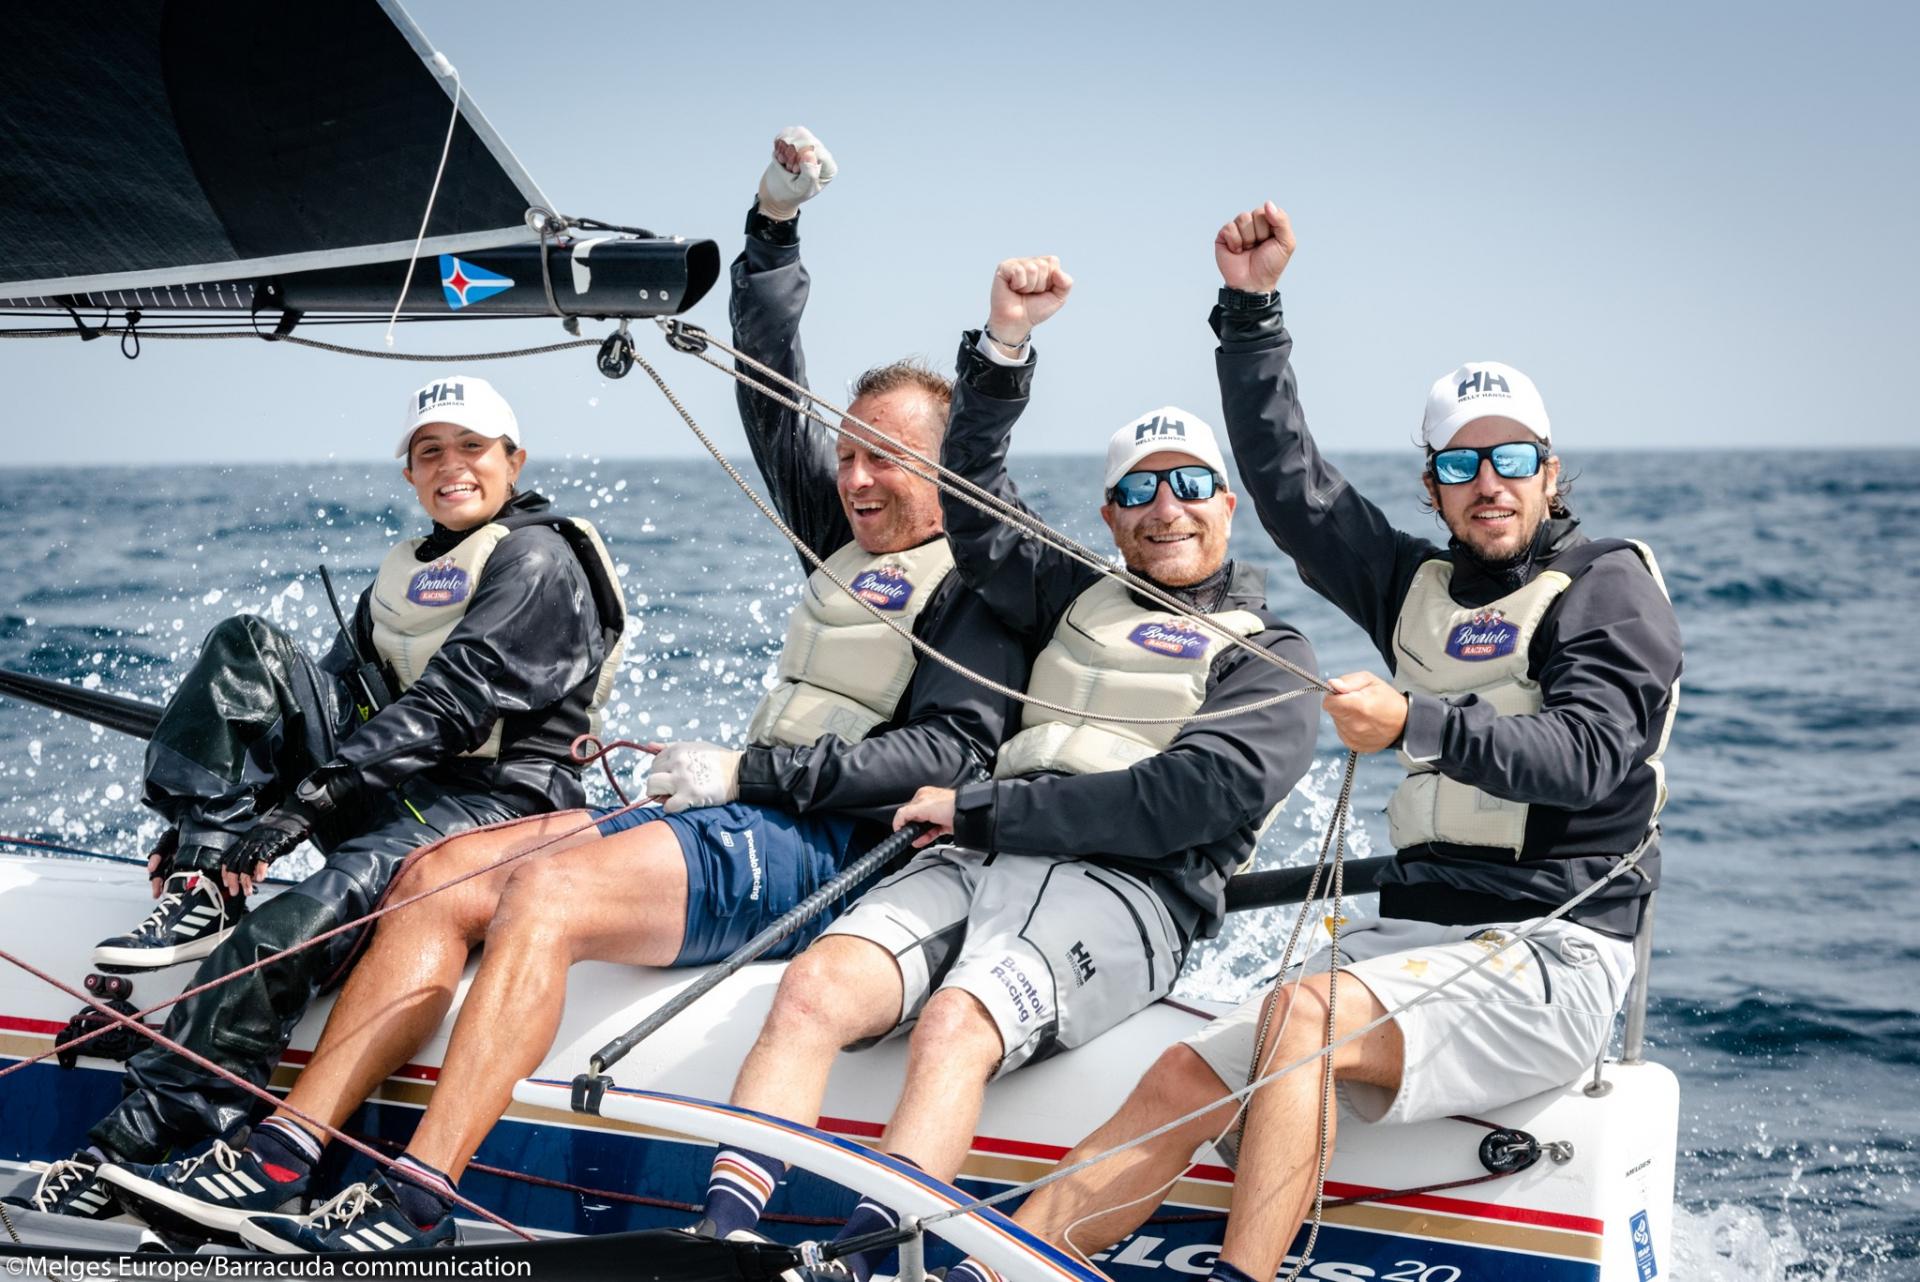 Il socio YCCS Pacinotti è Campione Europeo Melges 20 - NEWS - Yacht Club Costa Smeralda